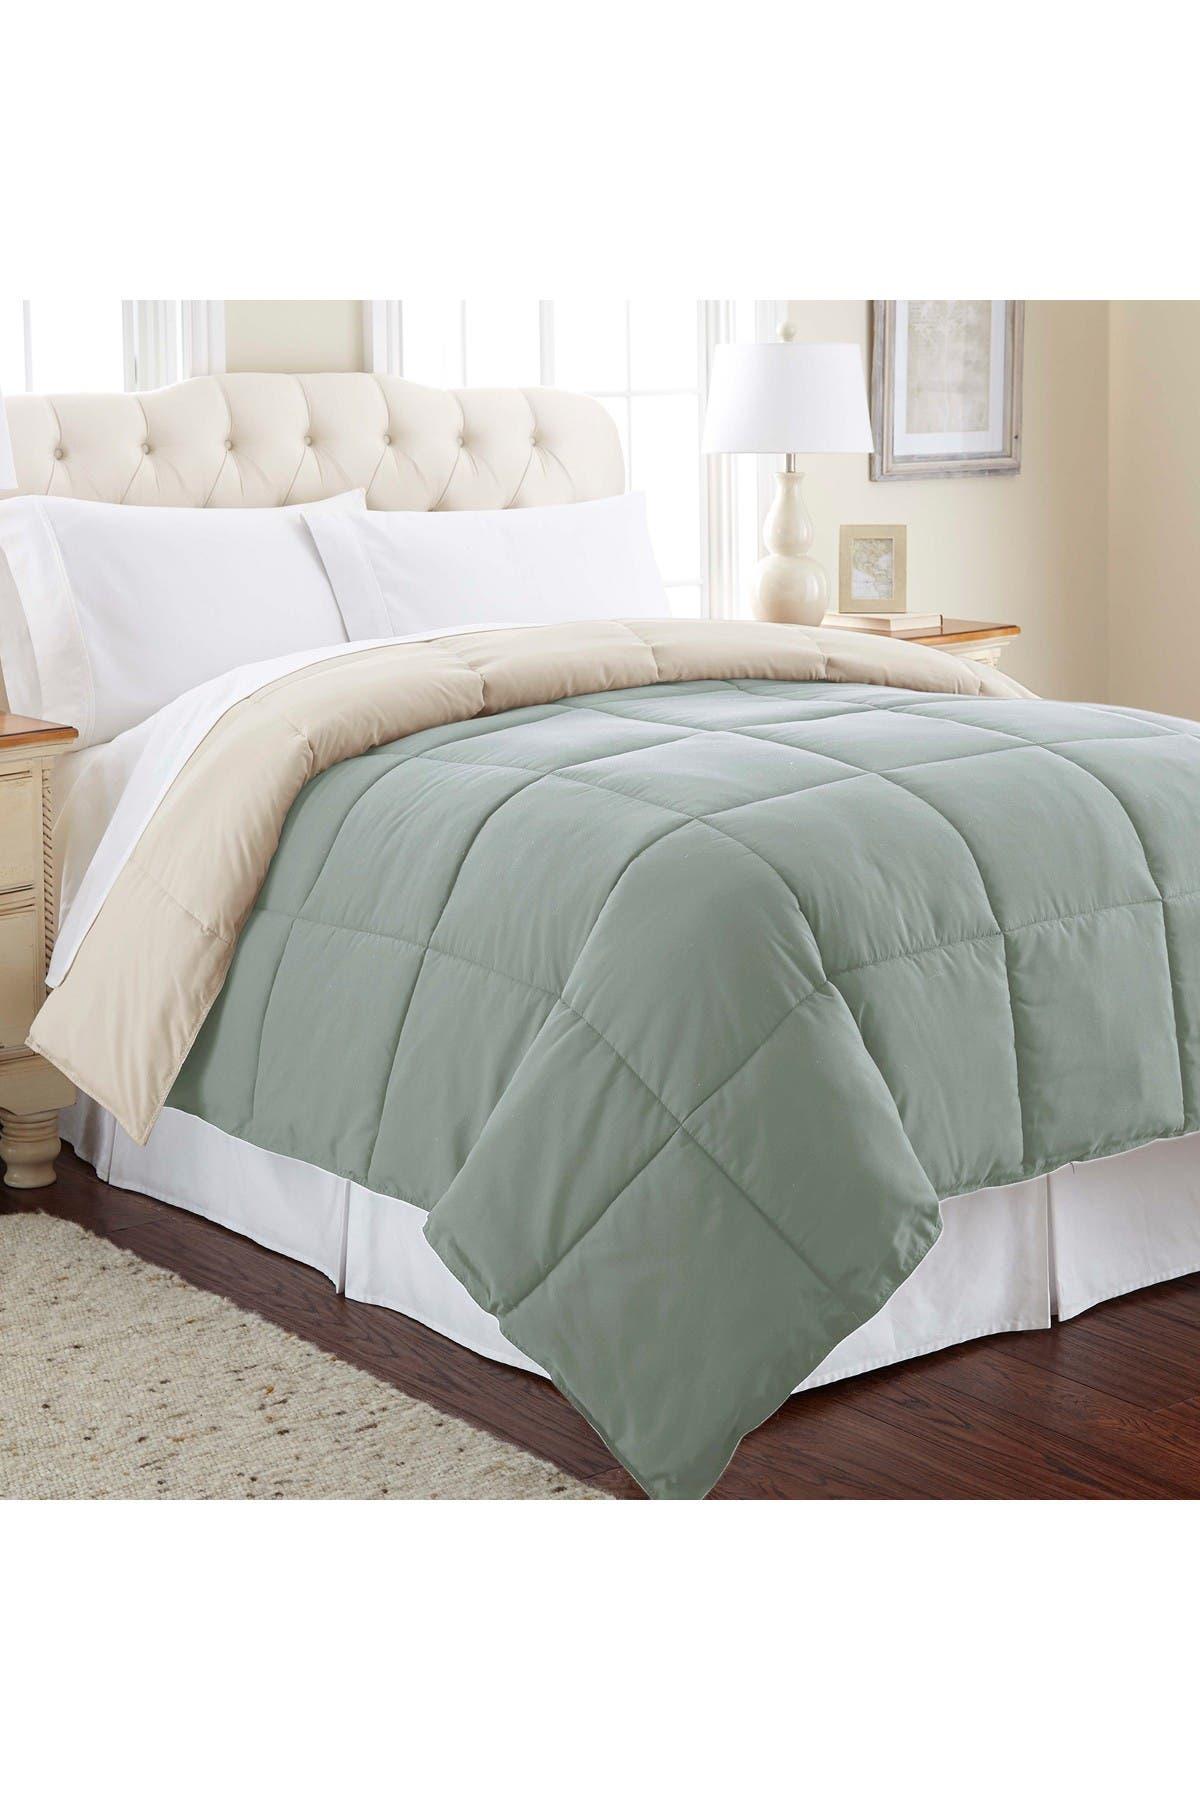 Image of Modern Threads Down Alternative Reversible King Comforter - Dusty Sage/Almond